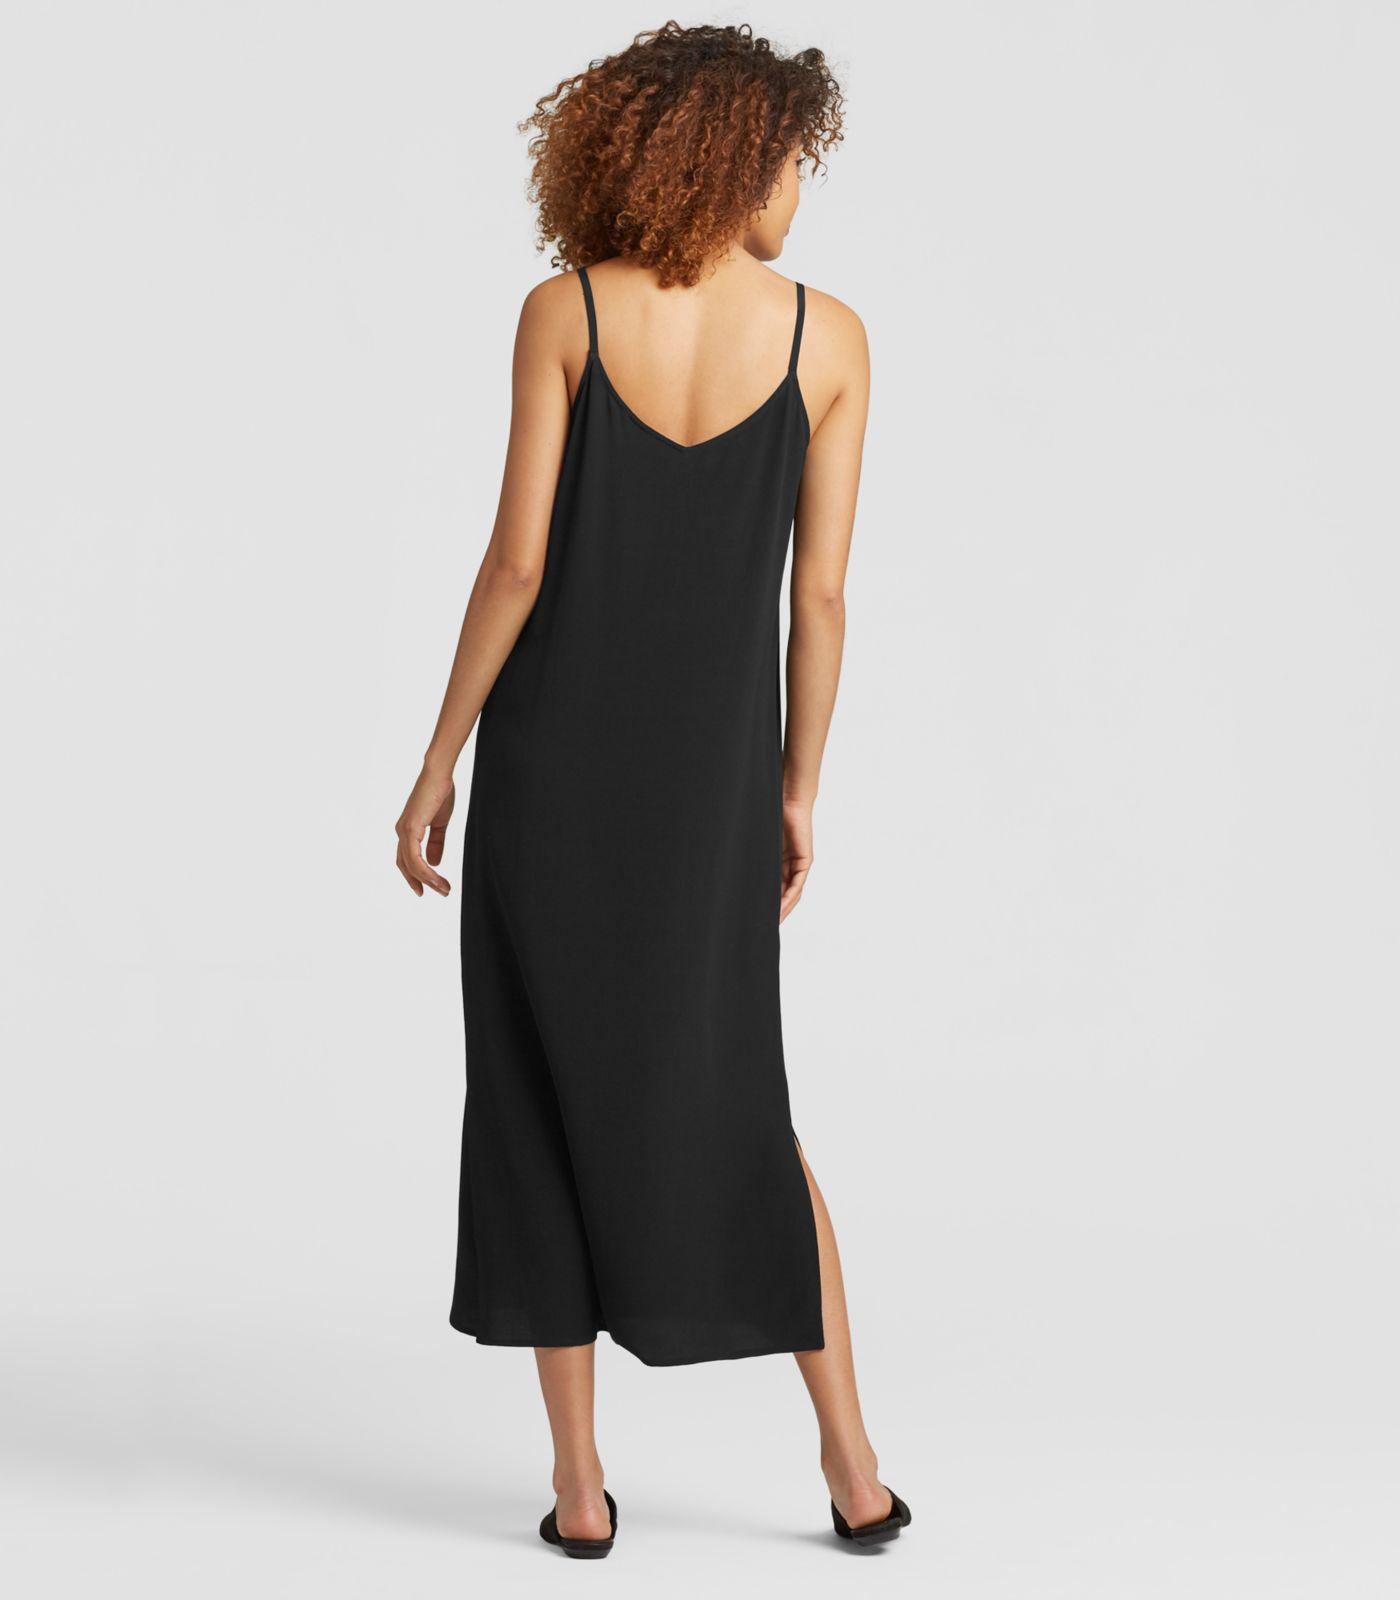 257f8981e0fea Eileen Fisher - Black Viscose Crepe Slip Dress - Lyst. View fullscreen